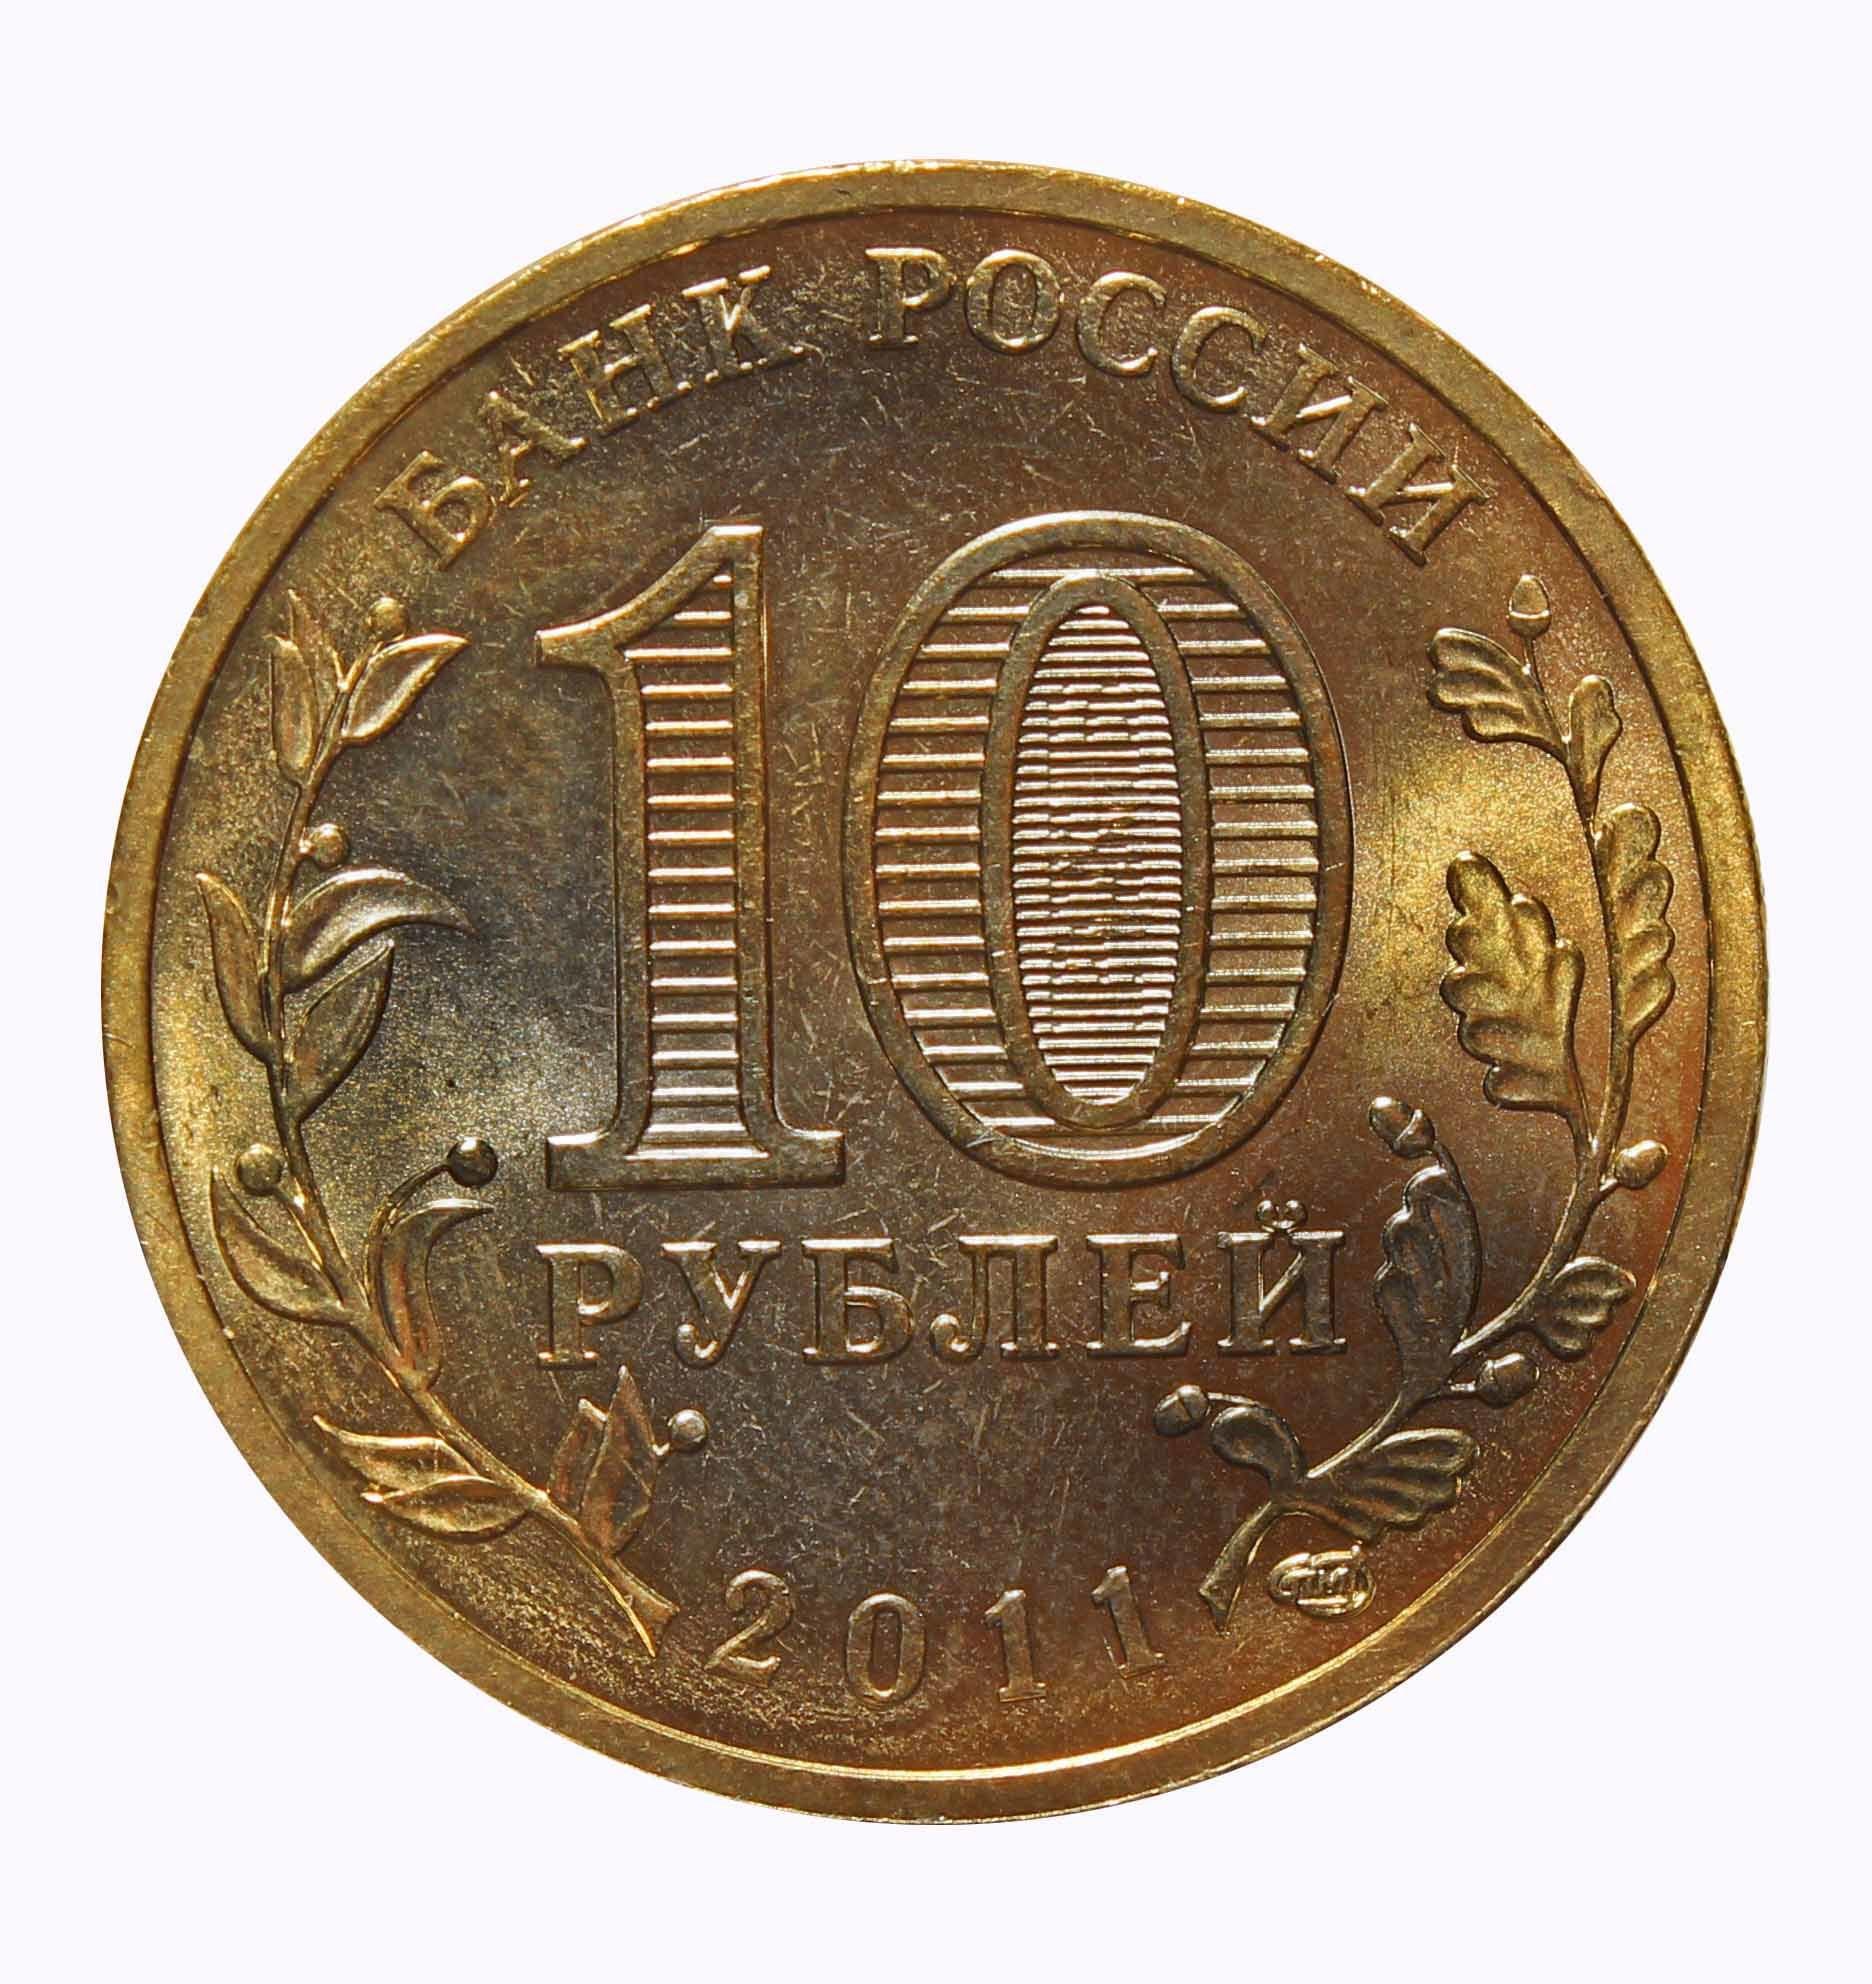 10 рублей Белгород (ГВС) 2011 г. XF